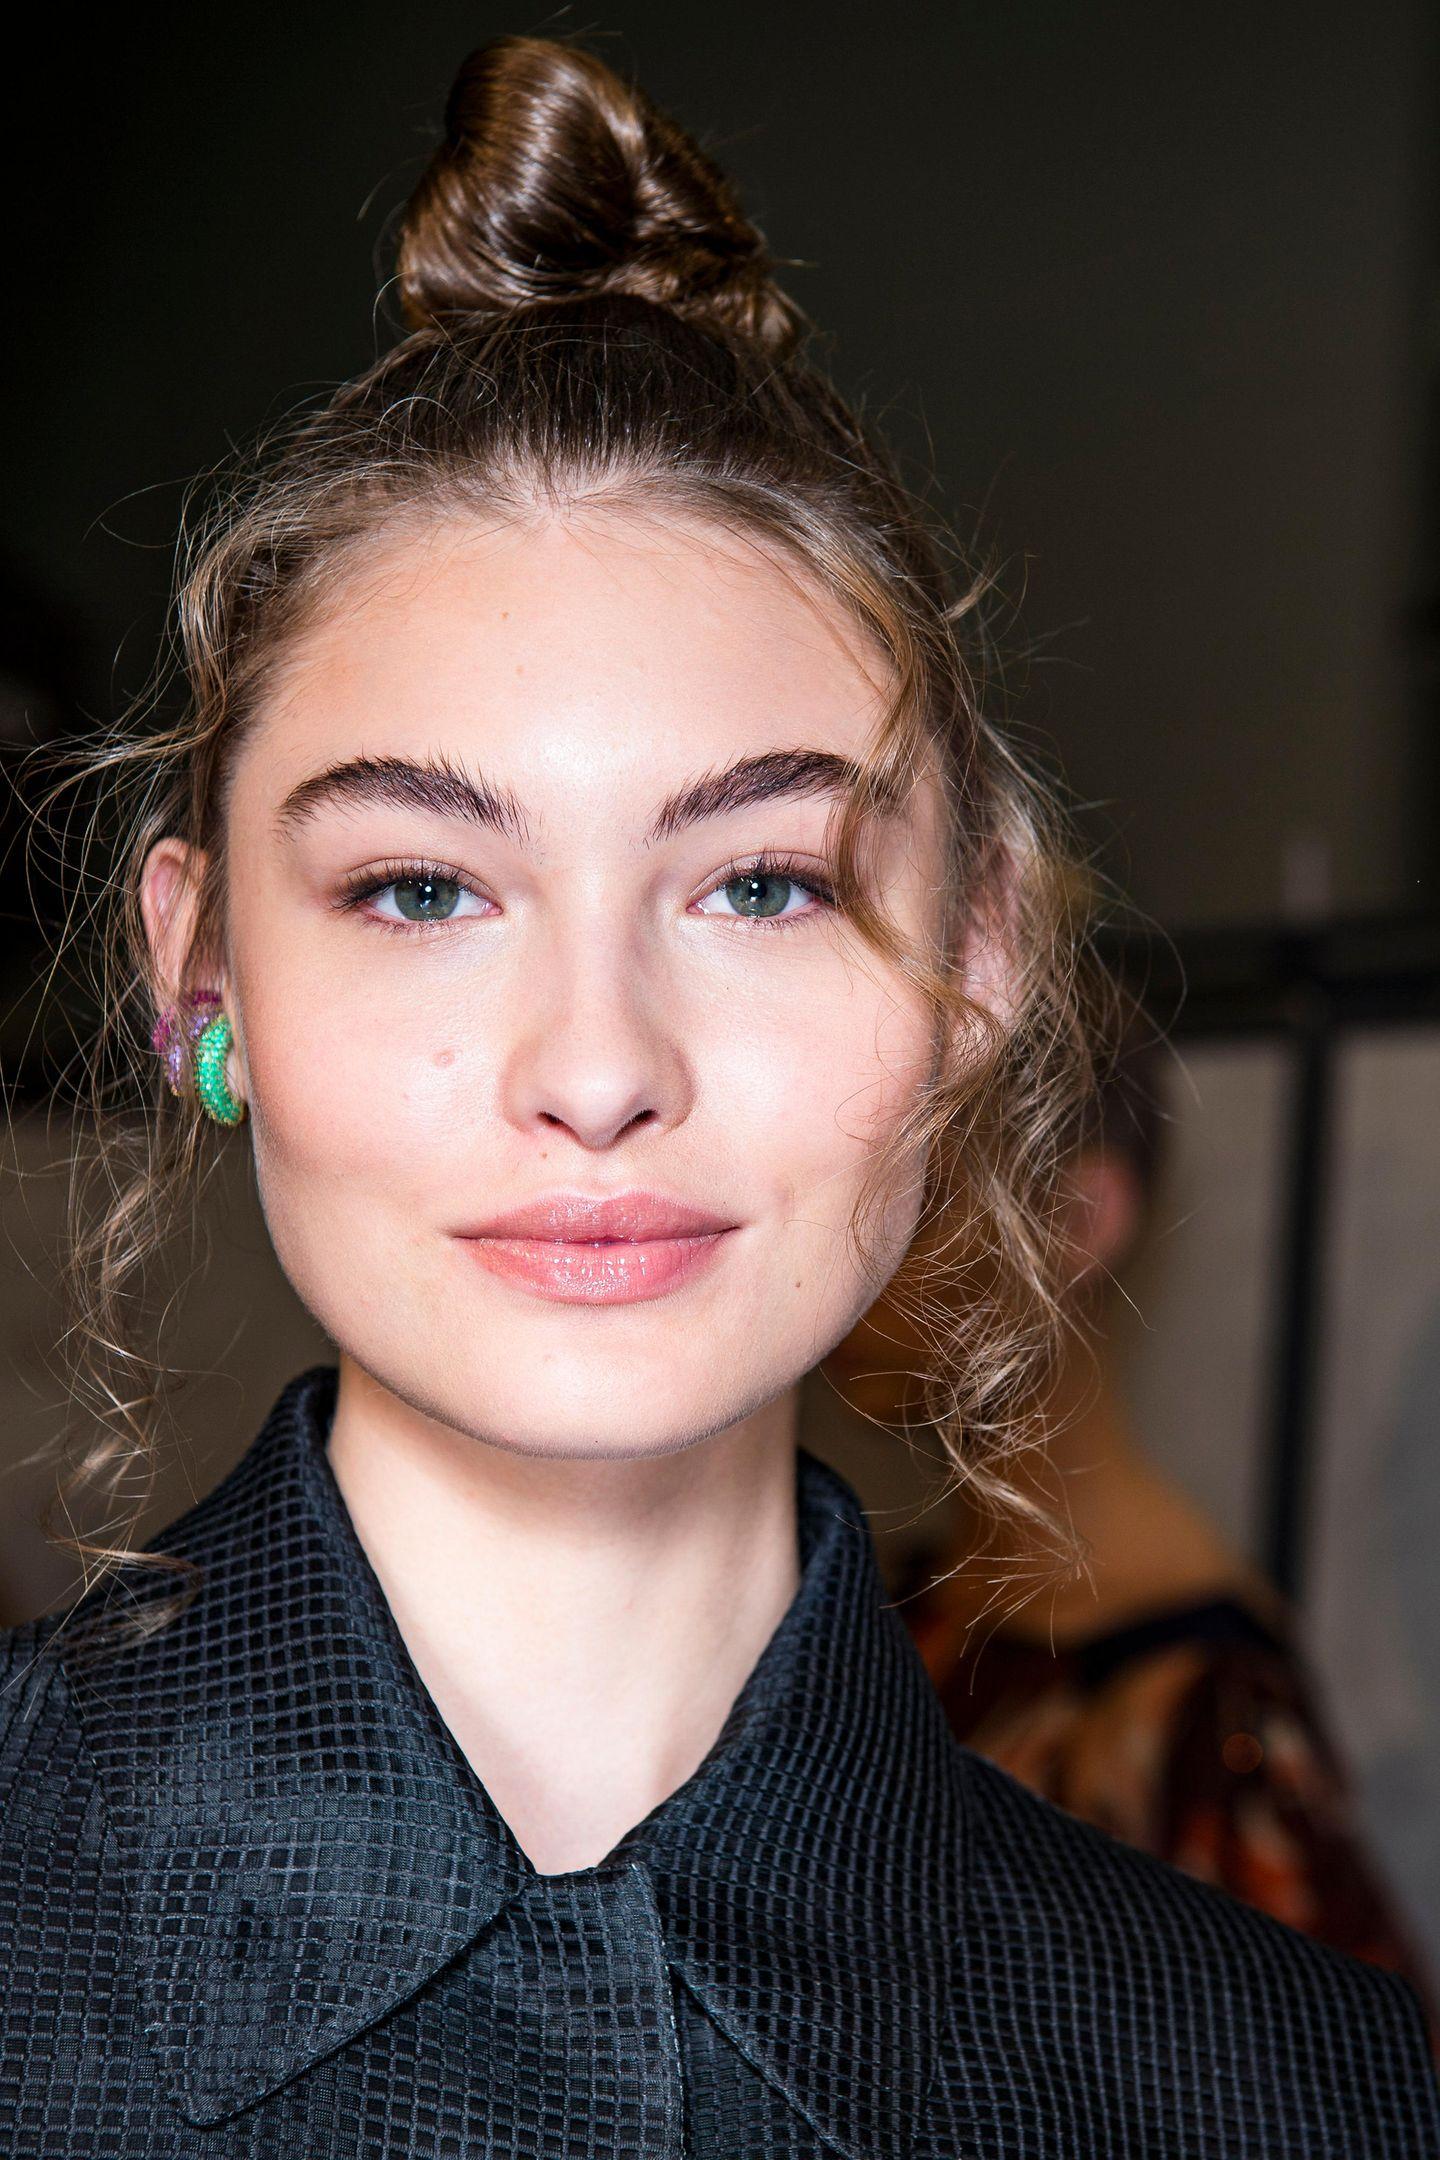 Dutt-Frisuren: Topknot mit lockeren Strähnen